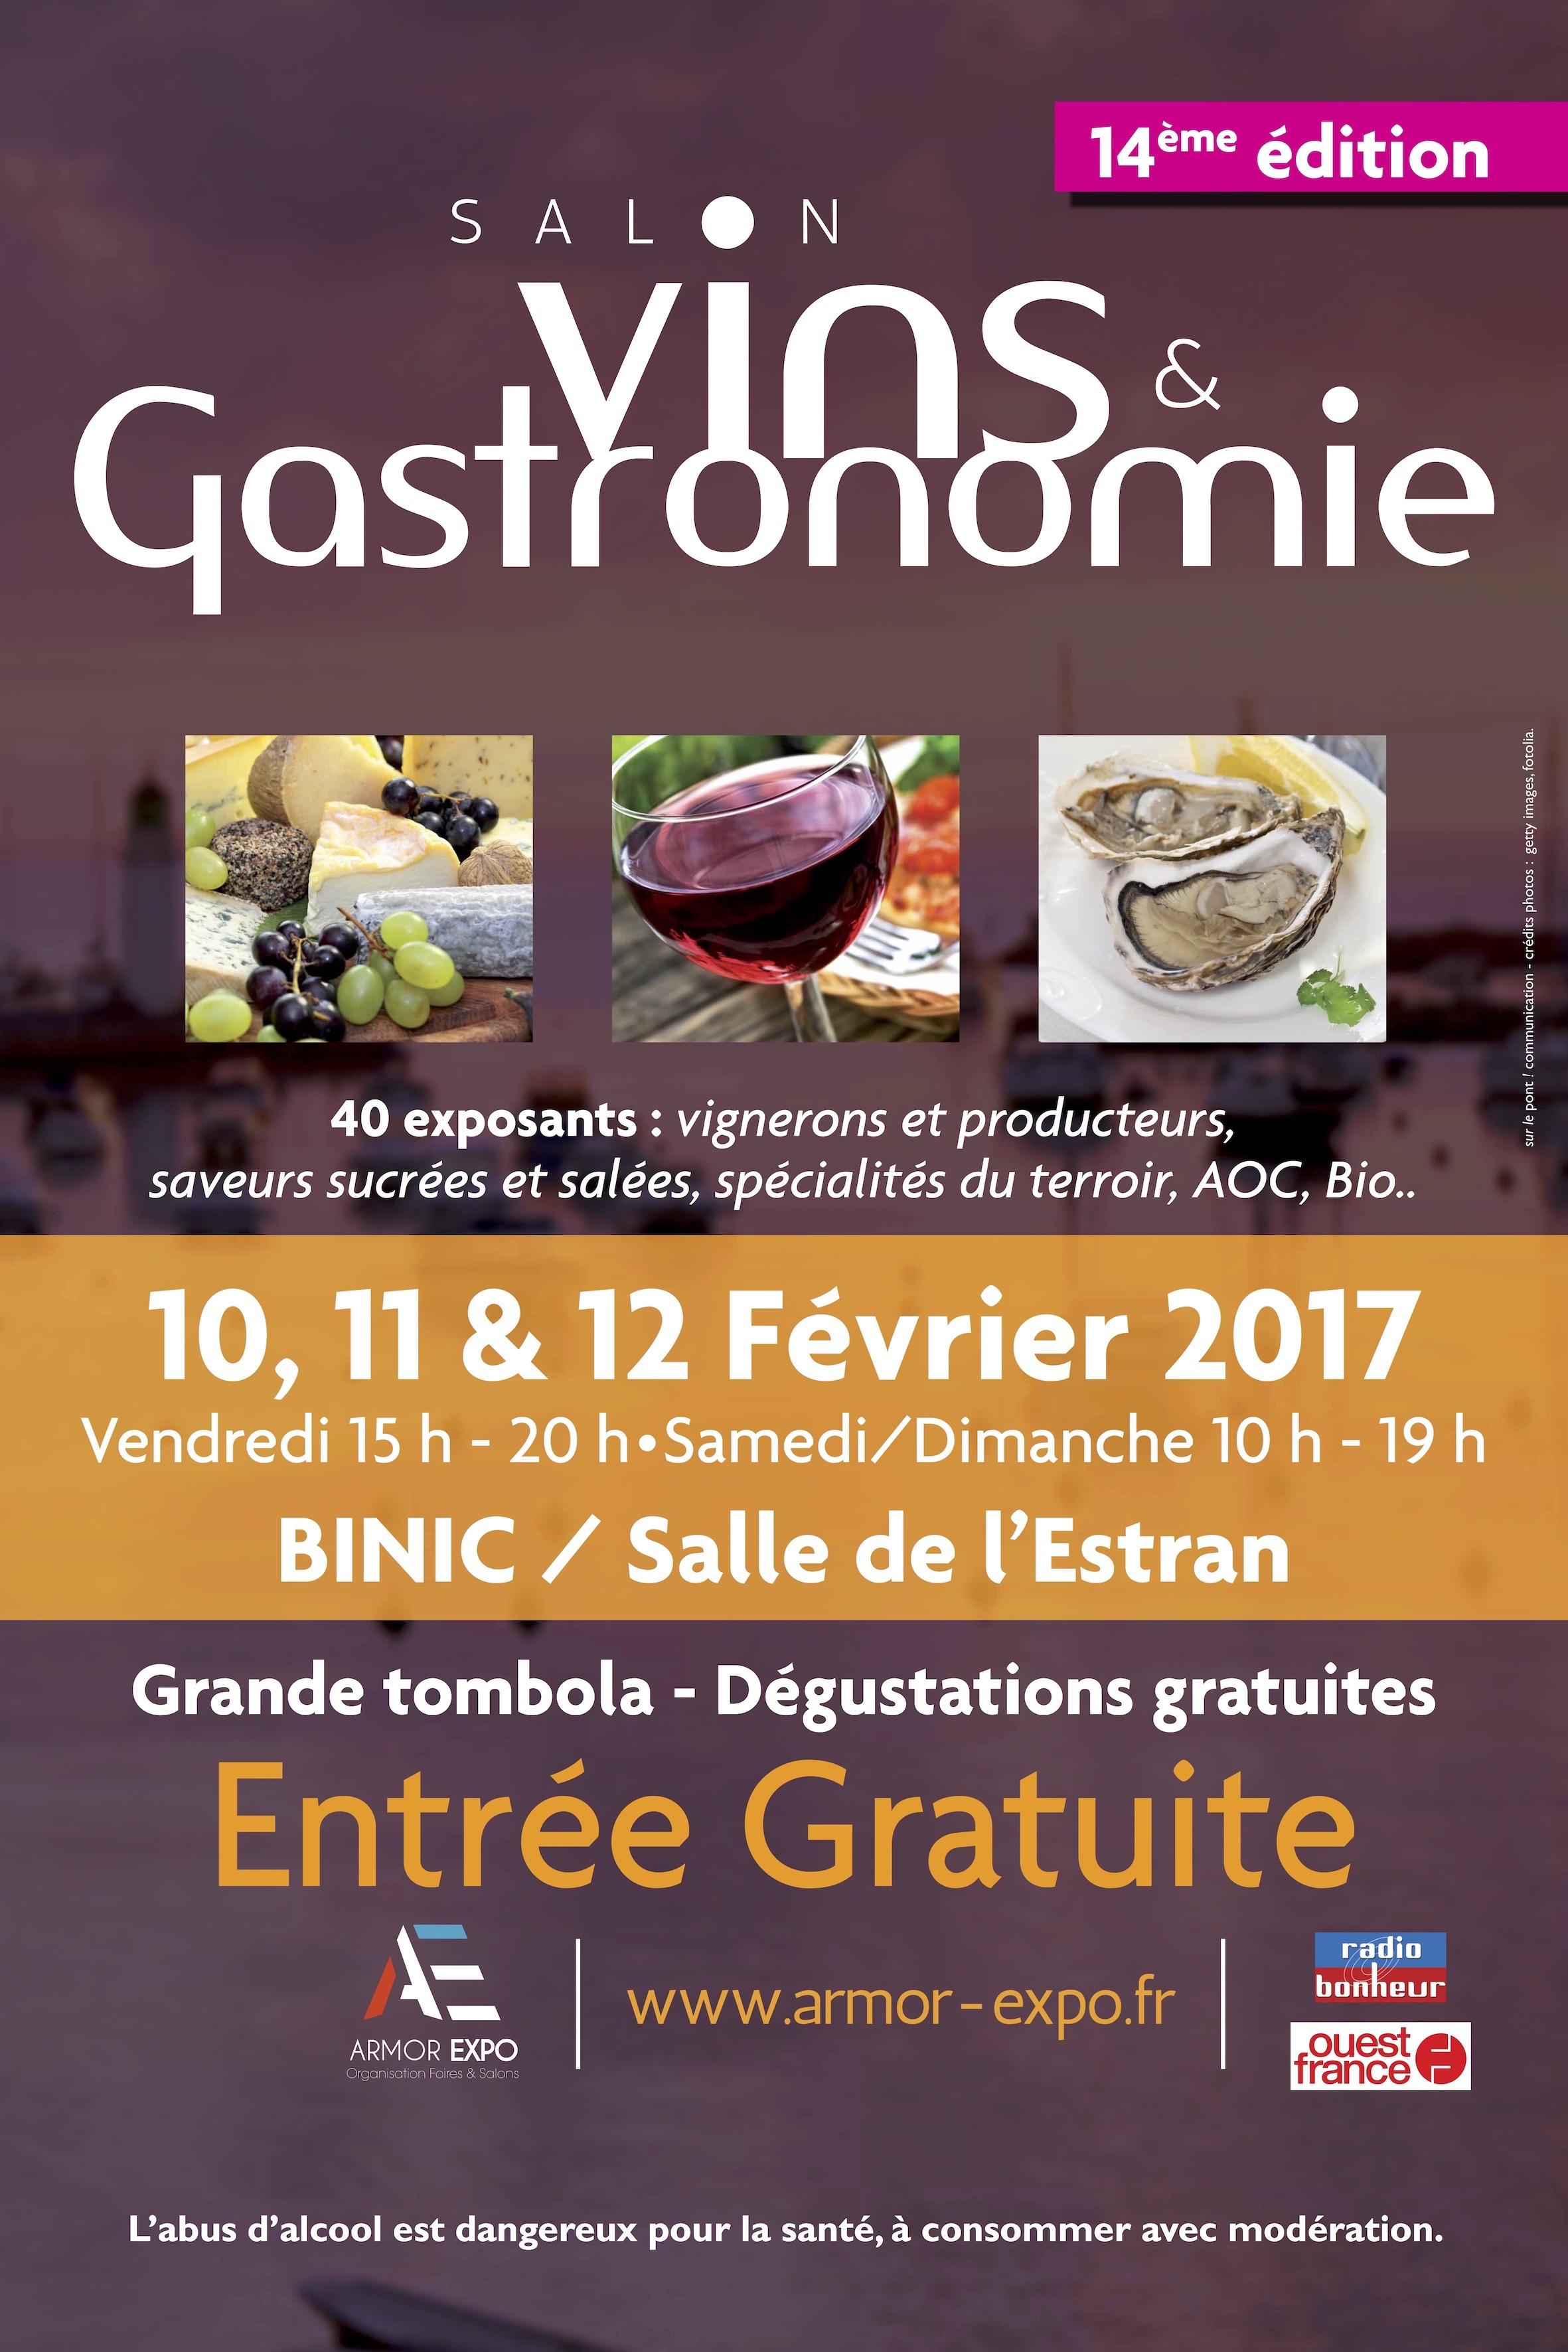 salon vins et gastronomie binic (22) binic (22520)